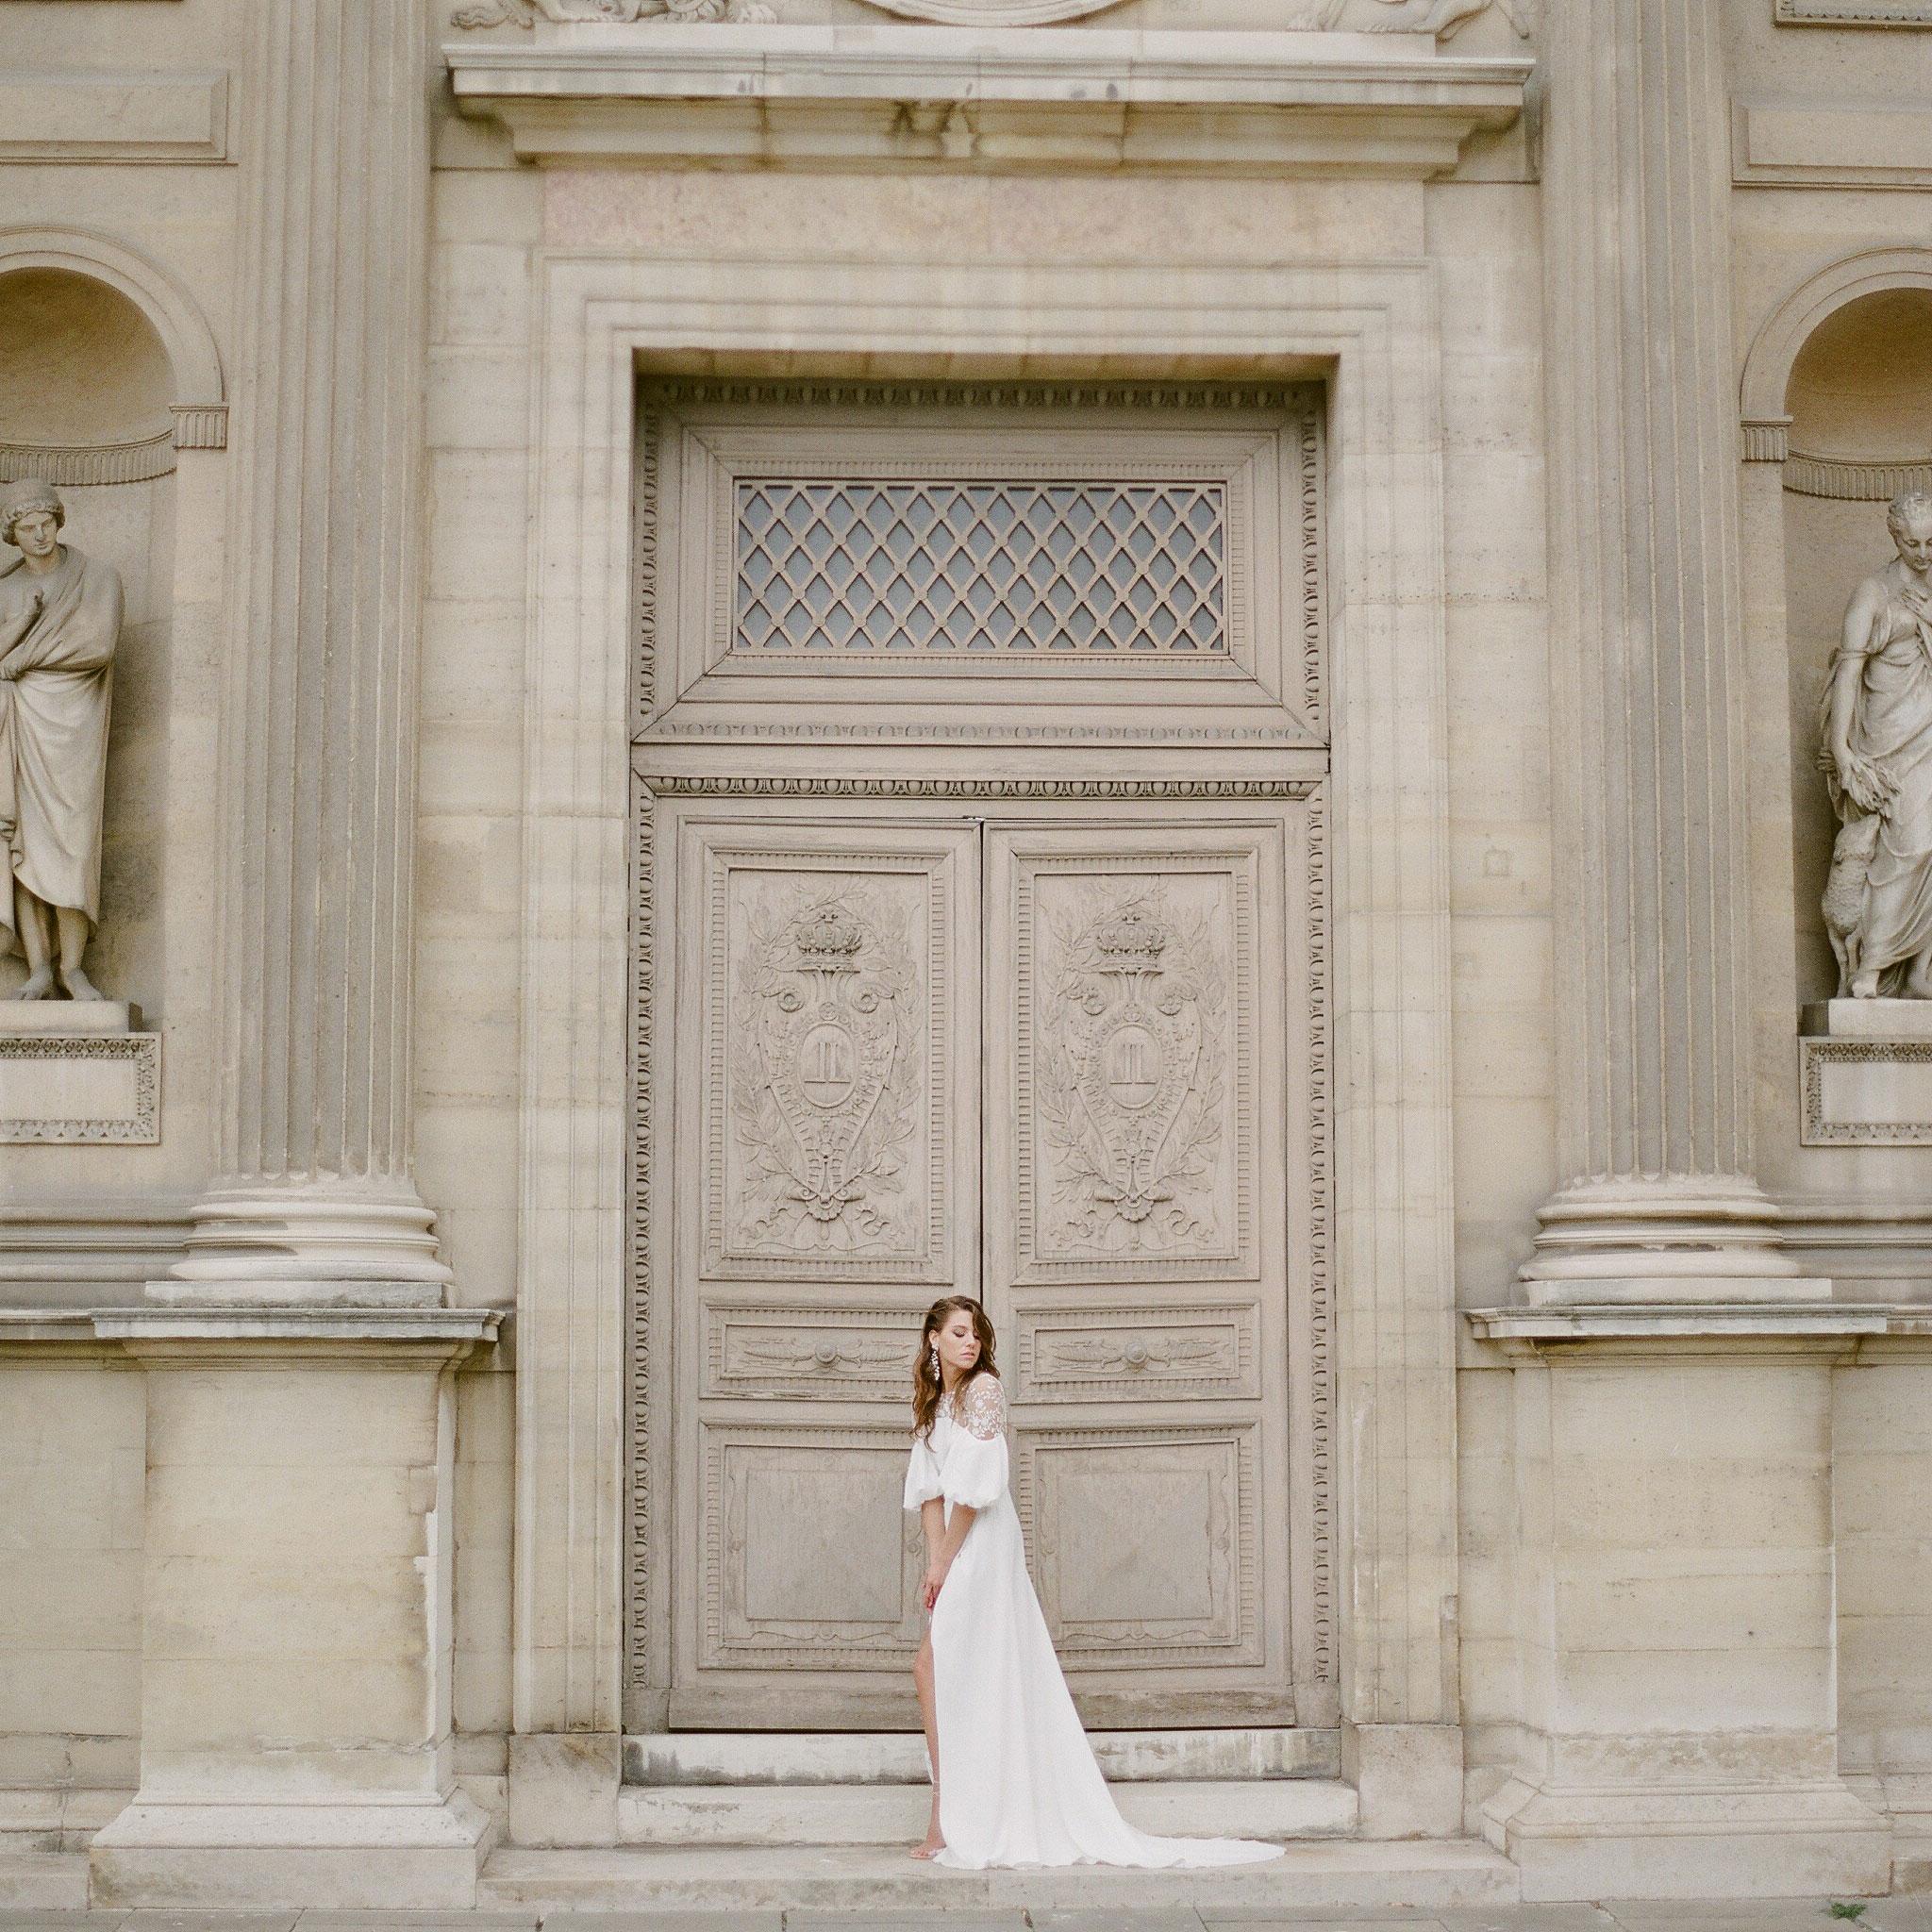 Paris---Ritz---Palzzo-Reale(C)Gianluca-Mary-Adovasio071.jpg